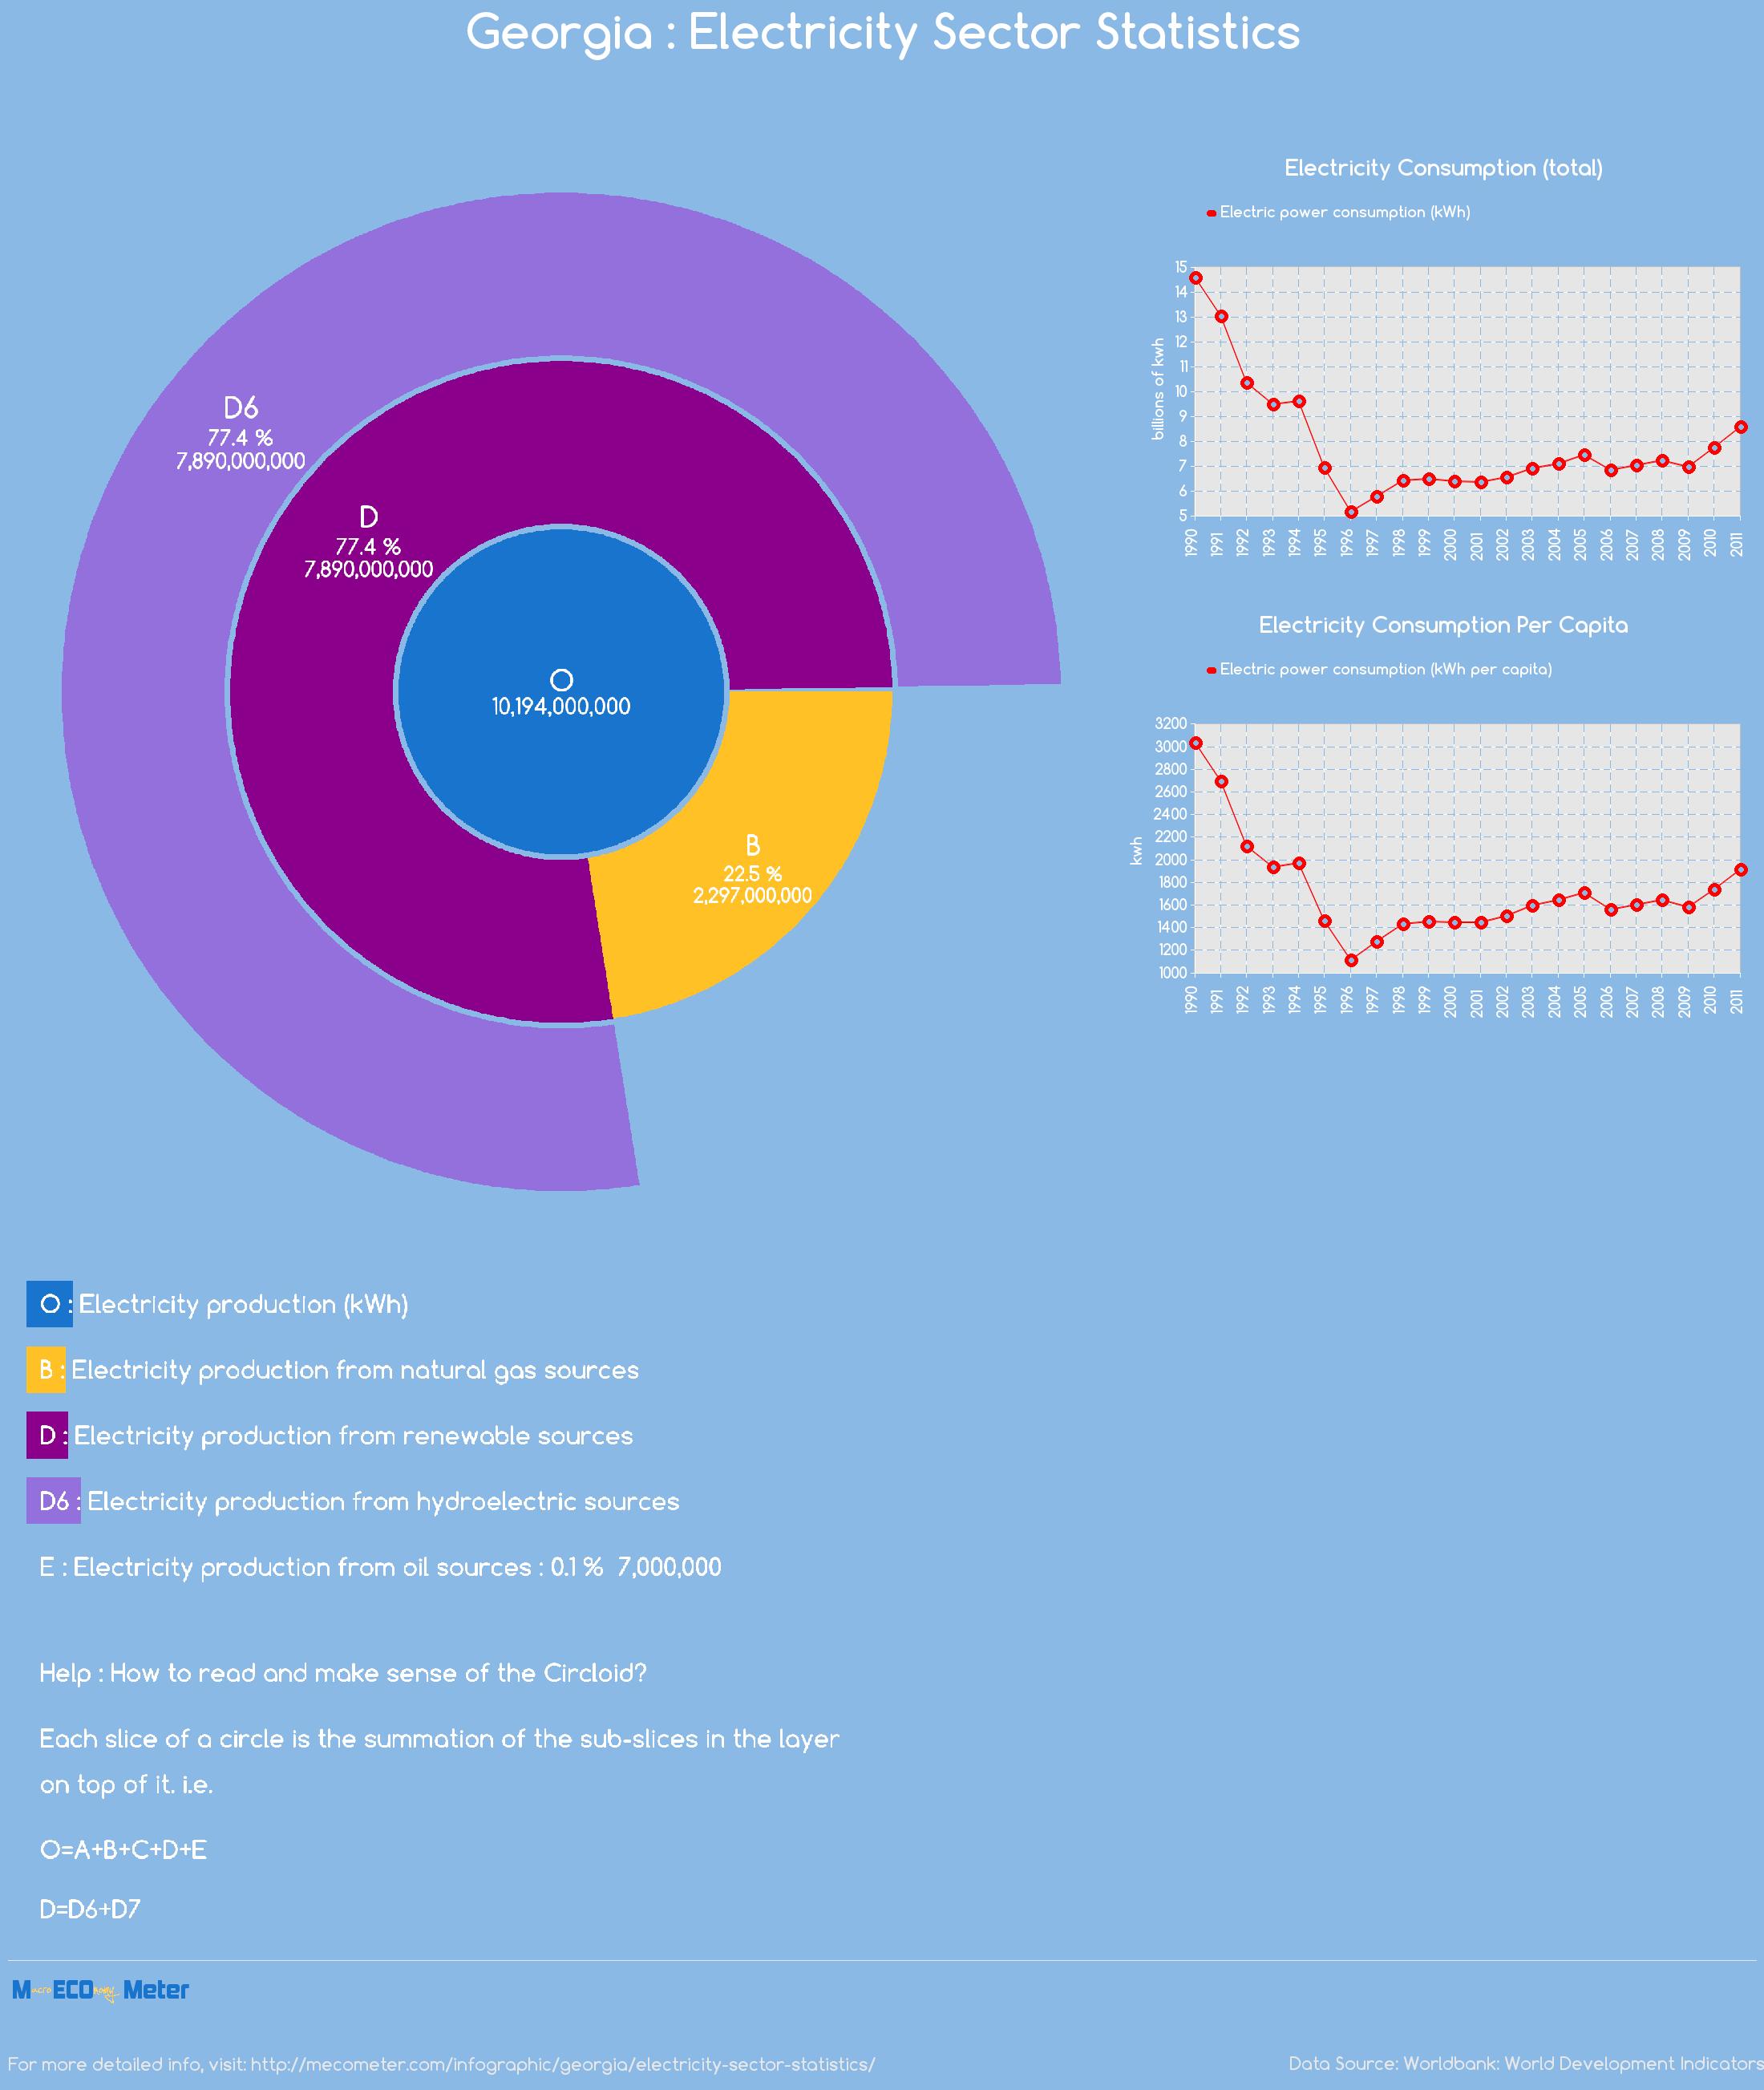 Georgia : Electricity Sector Statistics